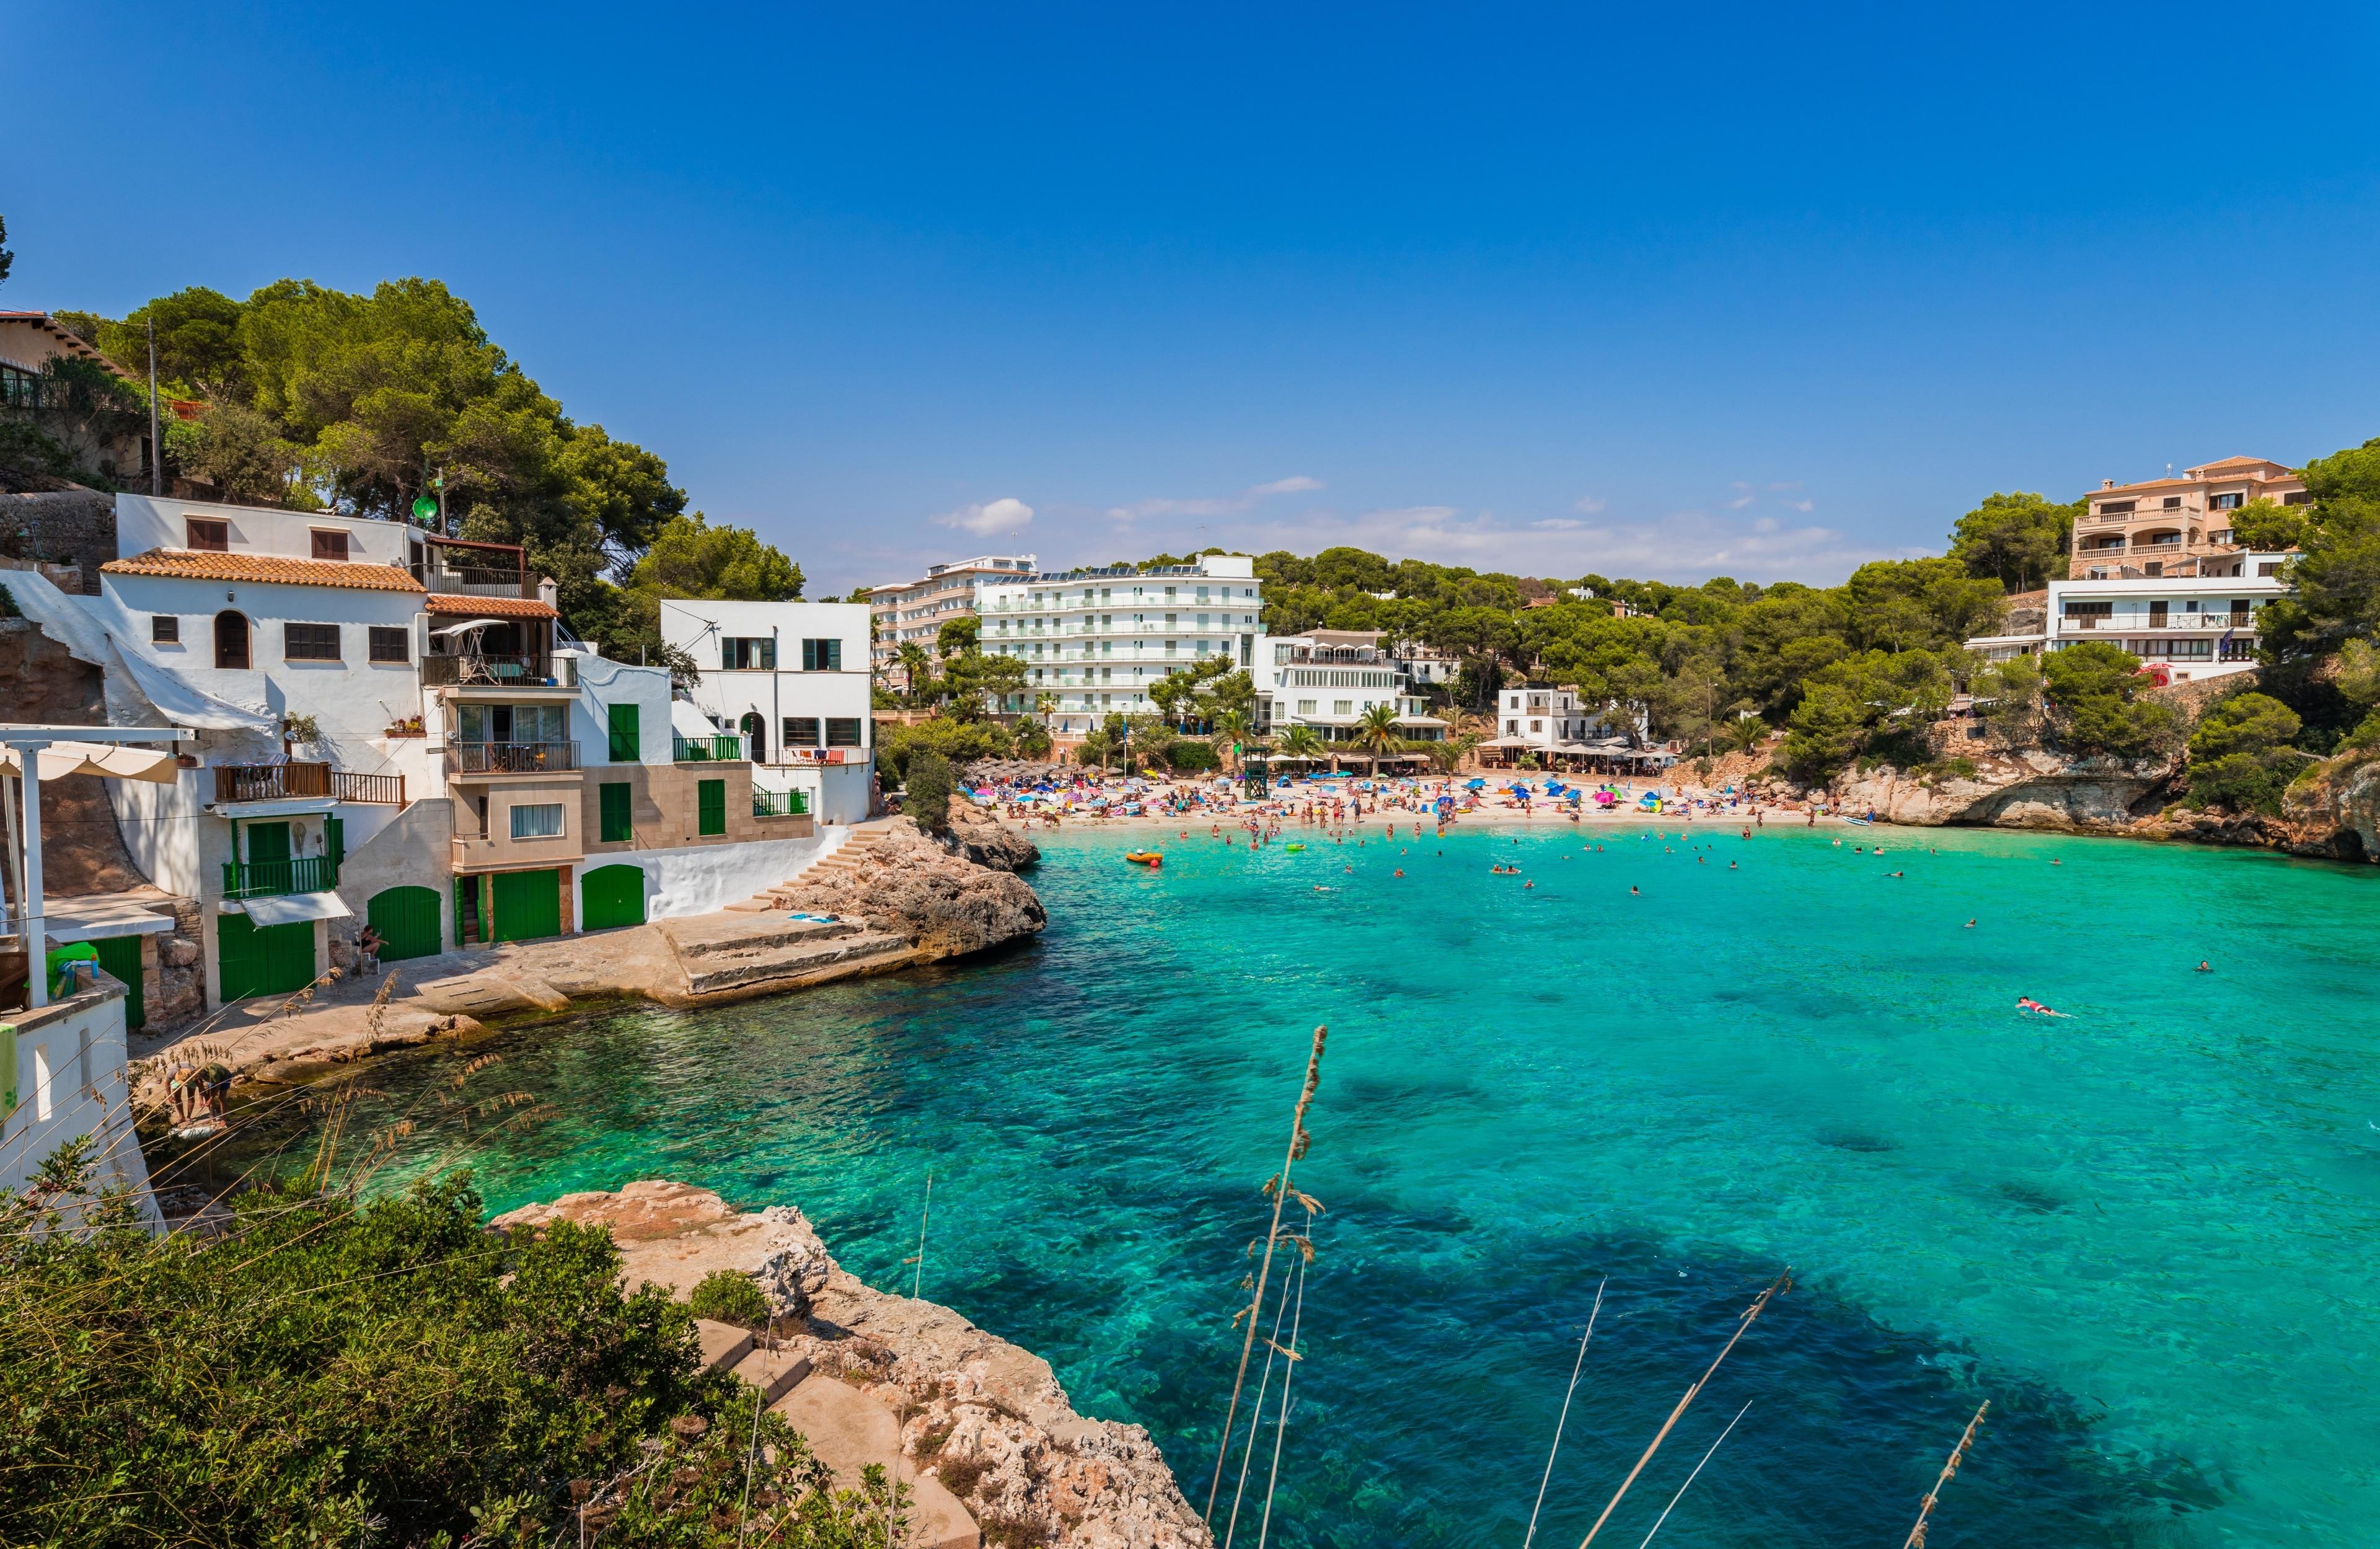 Cala Santany Beach, Santanyi, Balearic Islands, Spain